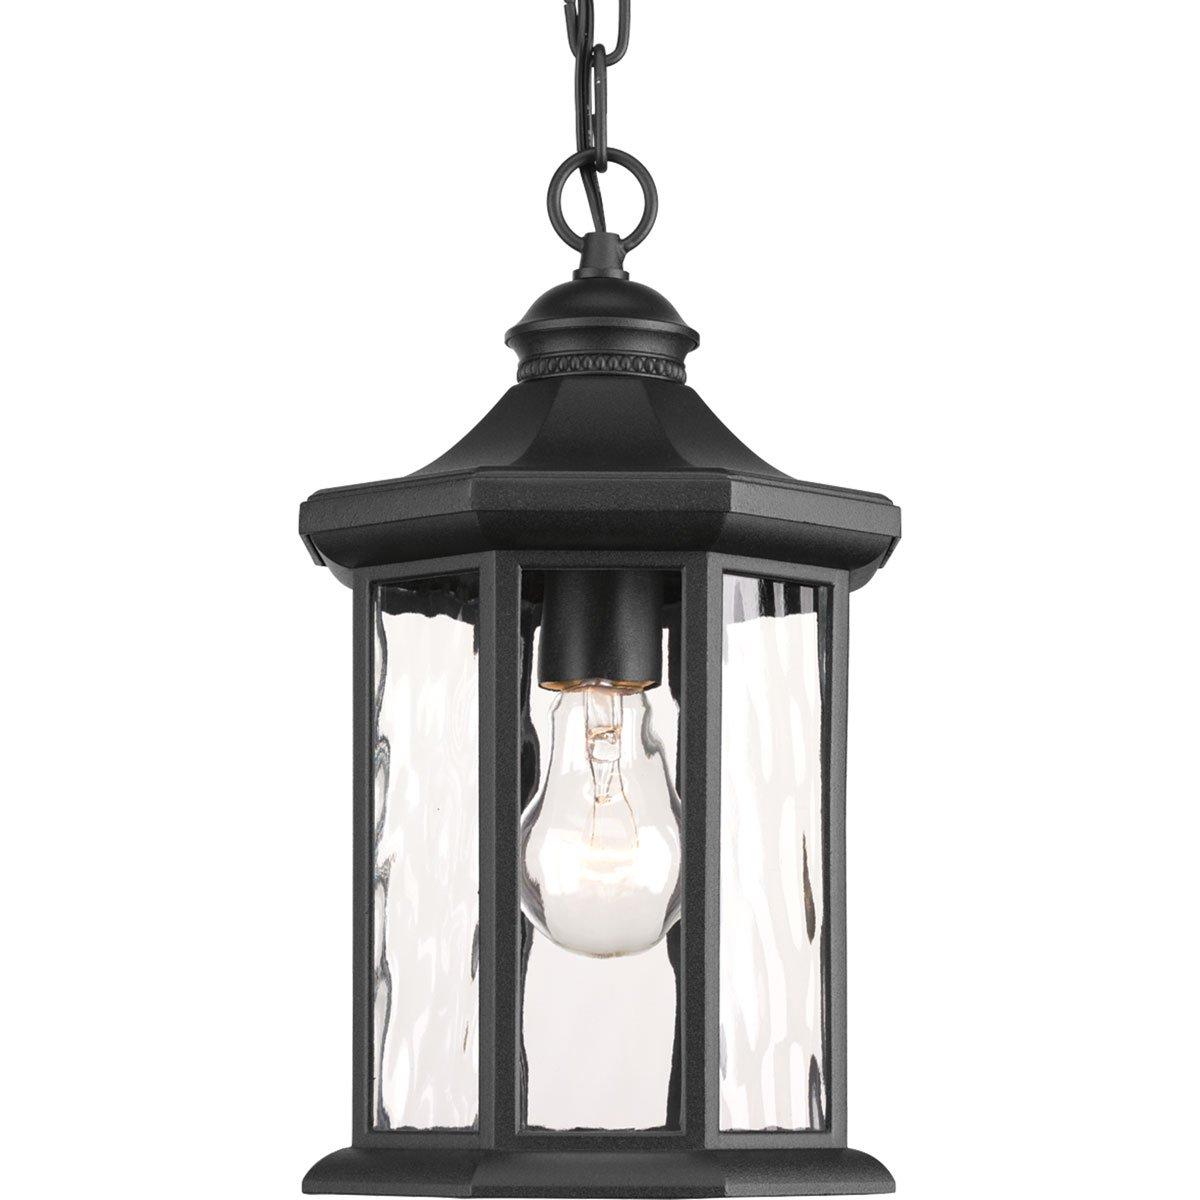 Progress Lighting P6529-31 Edition 1 Light Hanging Lantern, 7'' by Progress Lighting